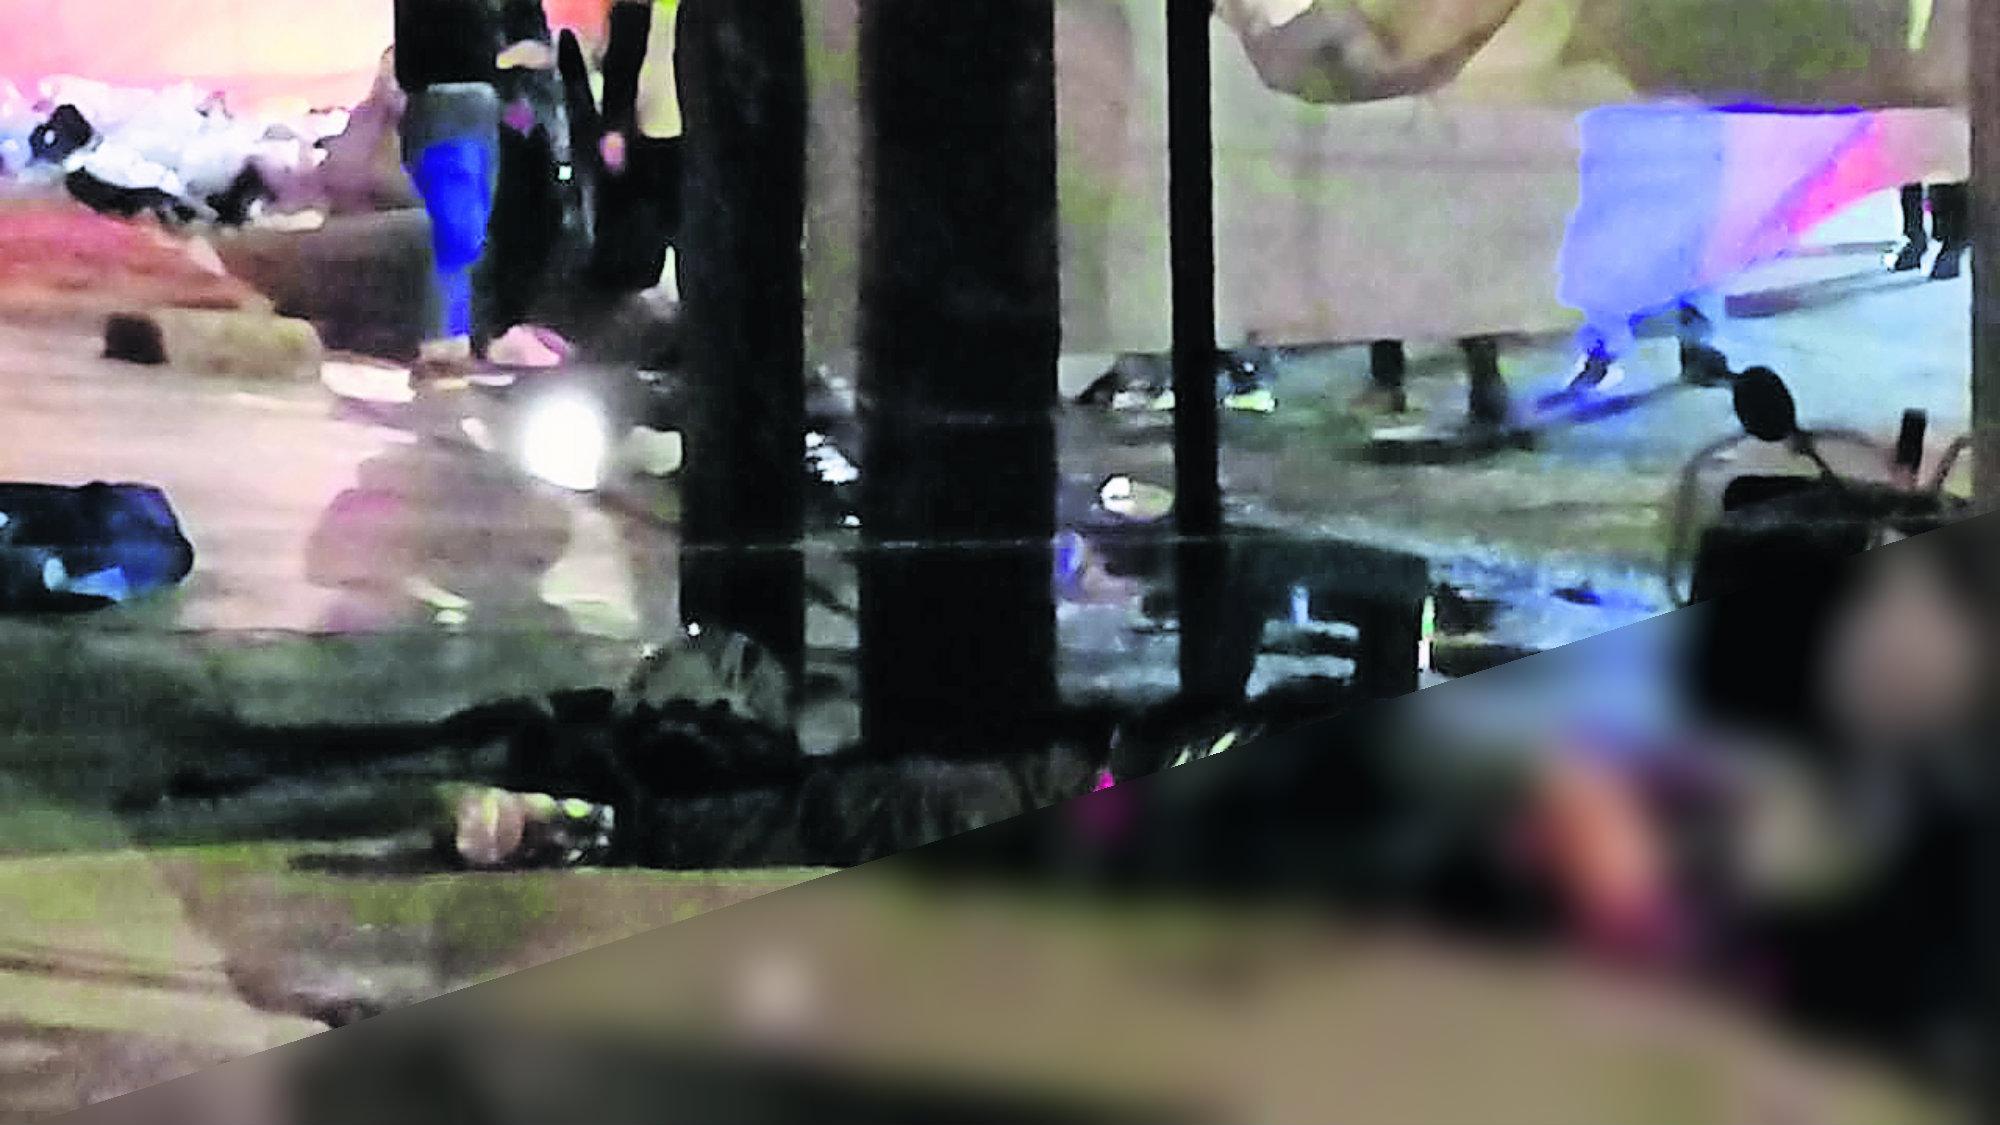 Ejecutan a sujeto Narcovenganza Tiro a la cabeza Motosicarios CDMX